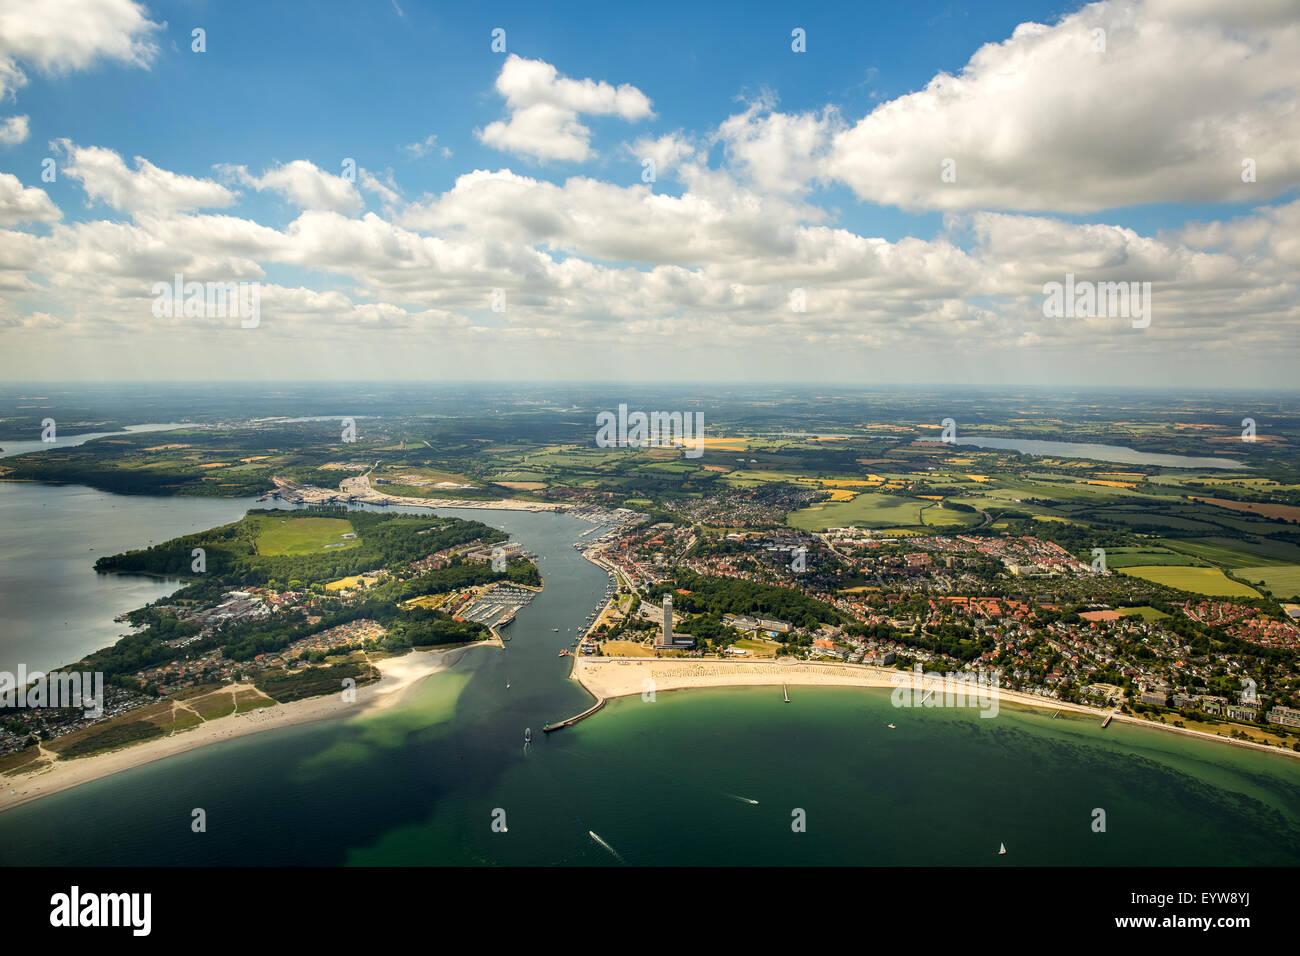 Bay of Lübeck, Travemünde, Dassow, Mecklenburg-Western Pomerania, Germany - Stock Image